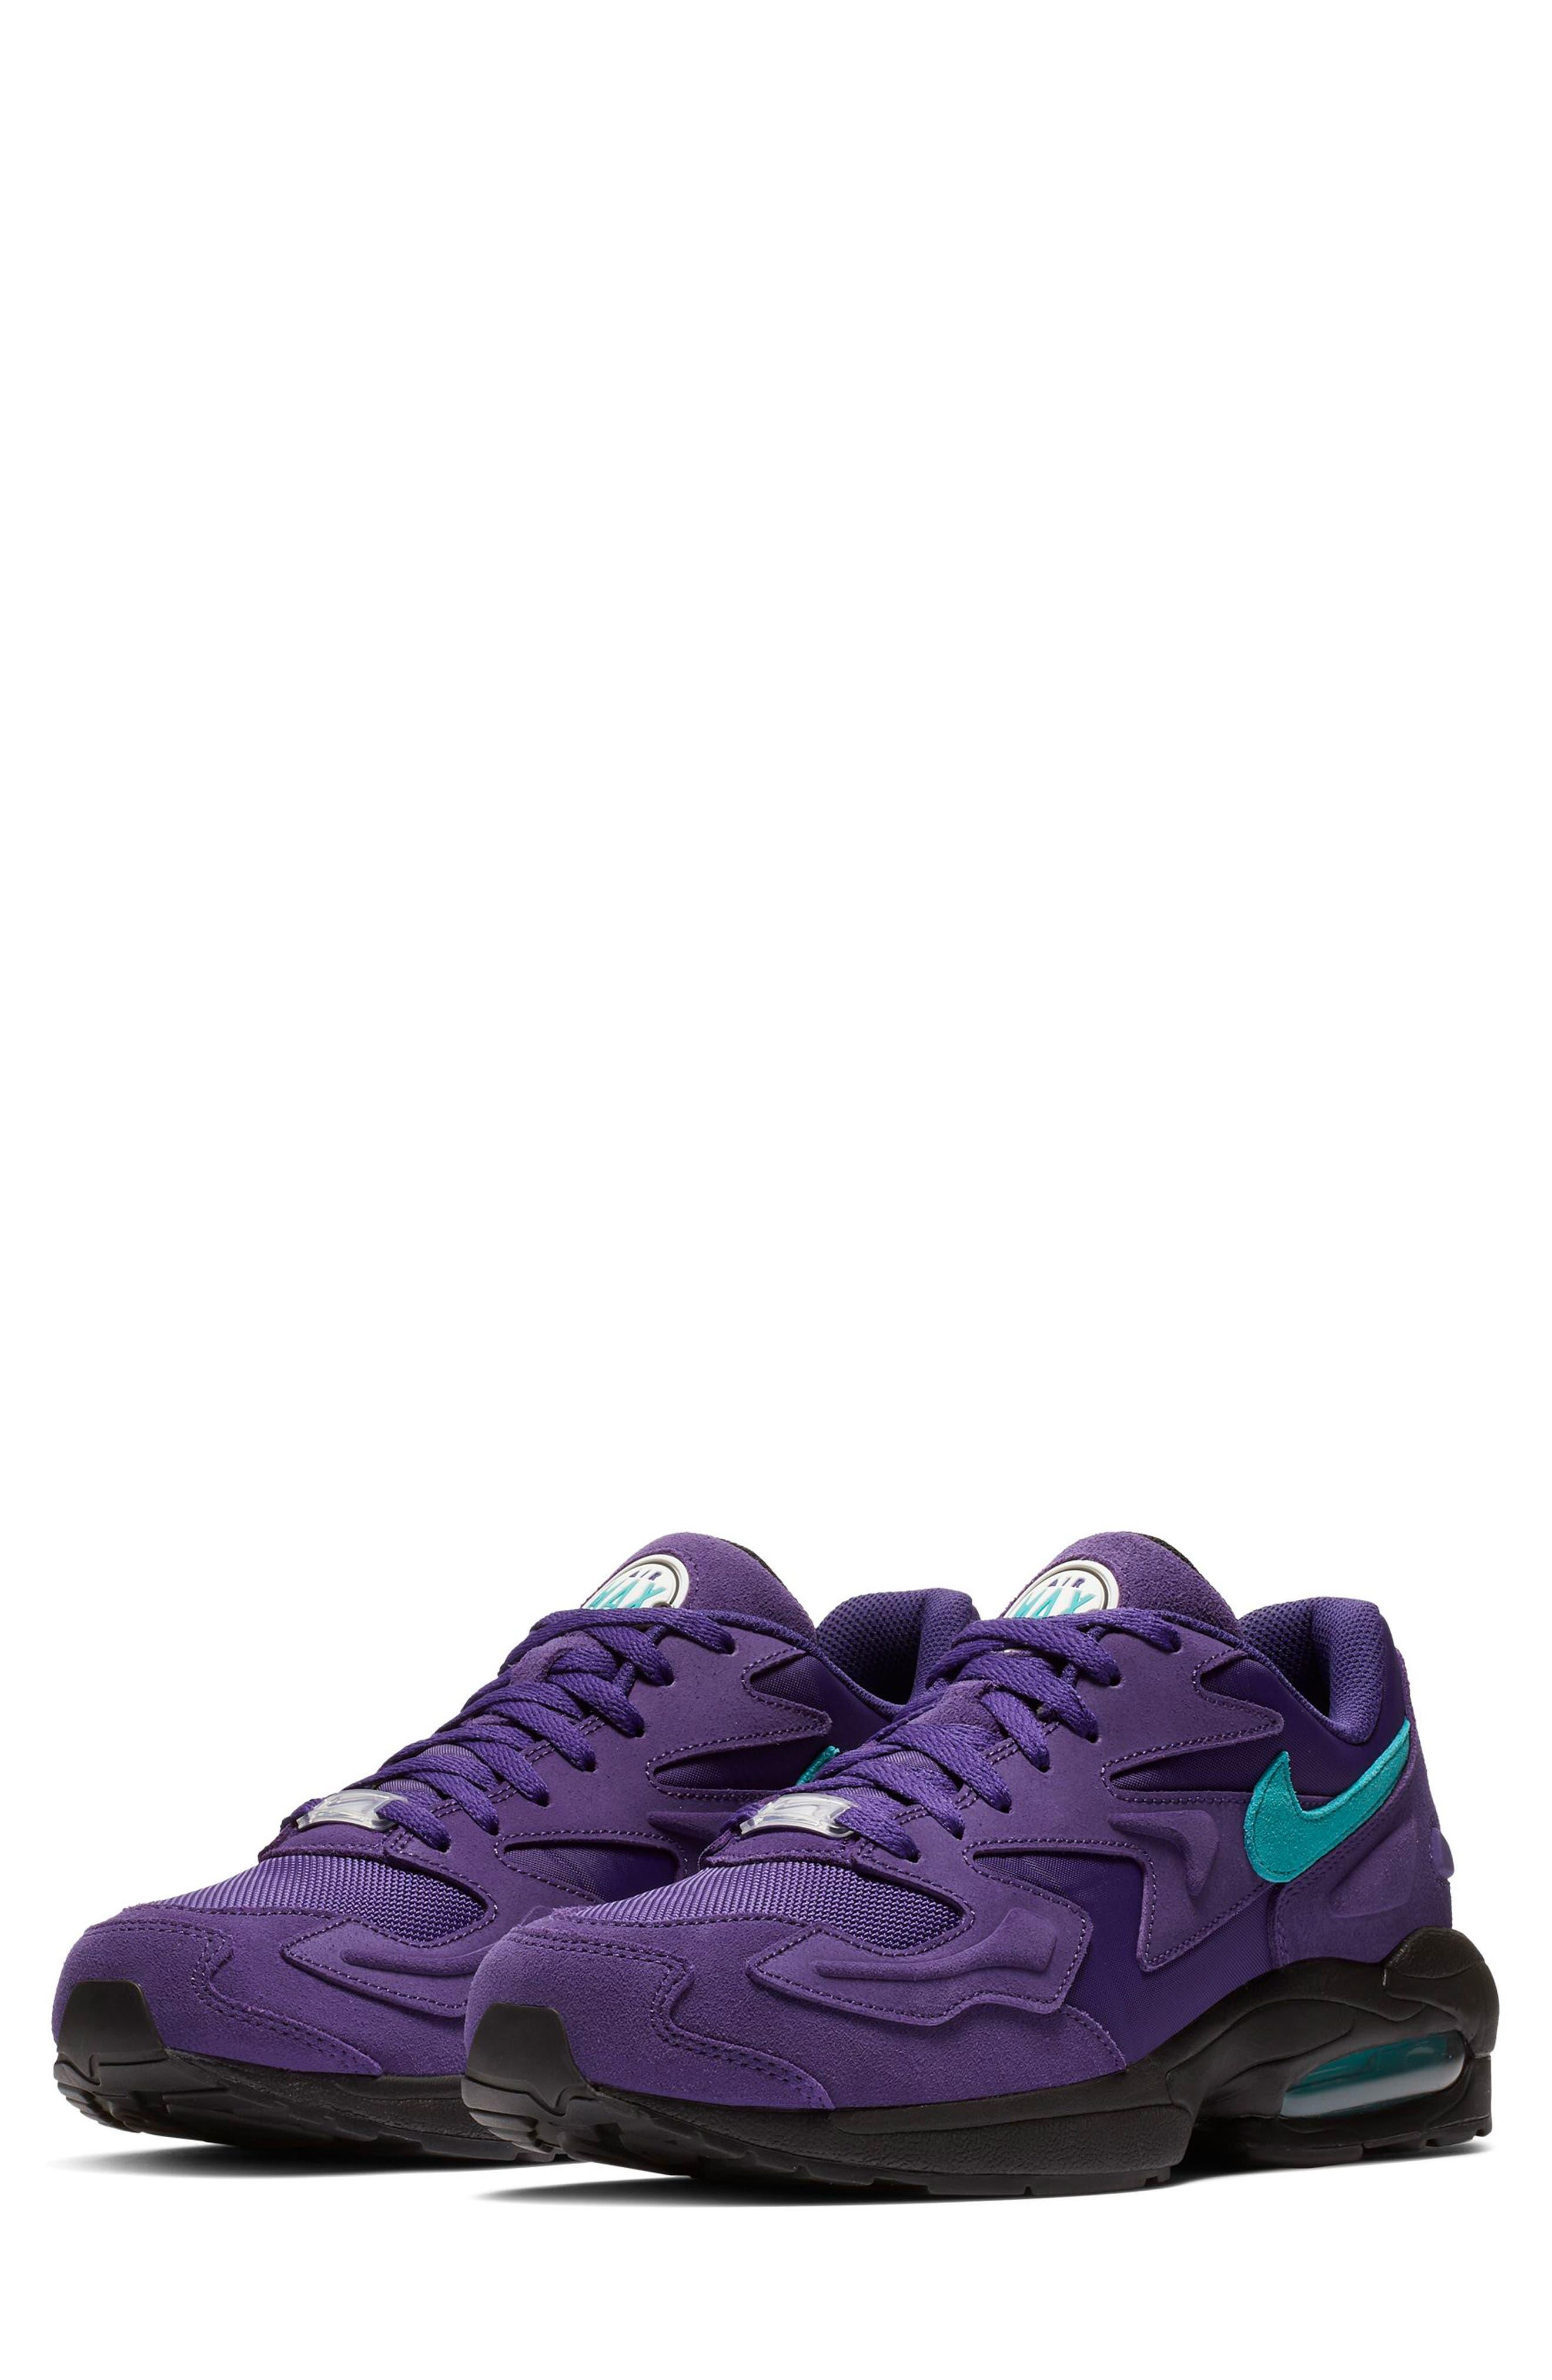 NIKE Air Max2 Light Sneaker, Main, color, PURPLE/ TEAL/ BLACK/ WHITE